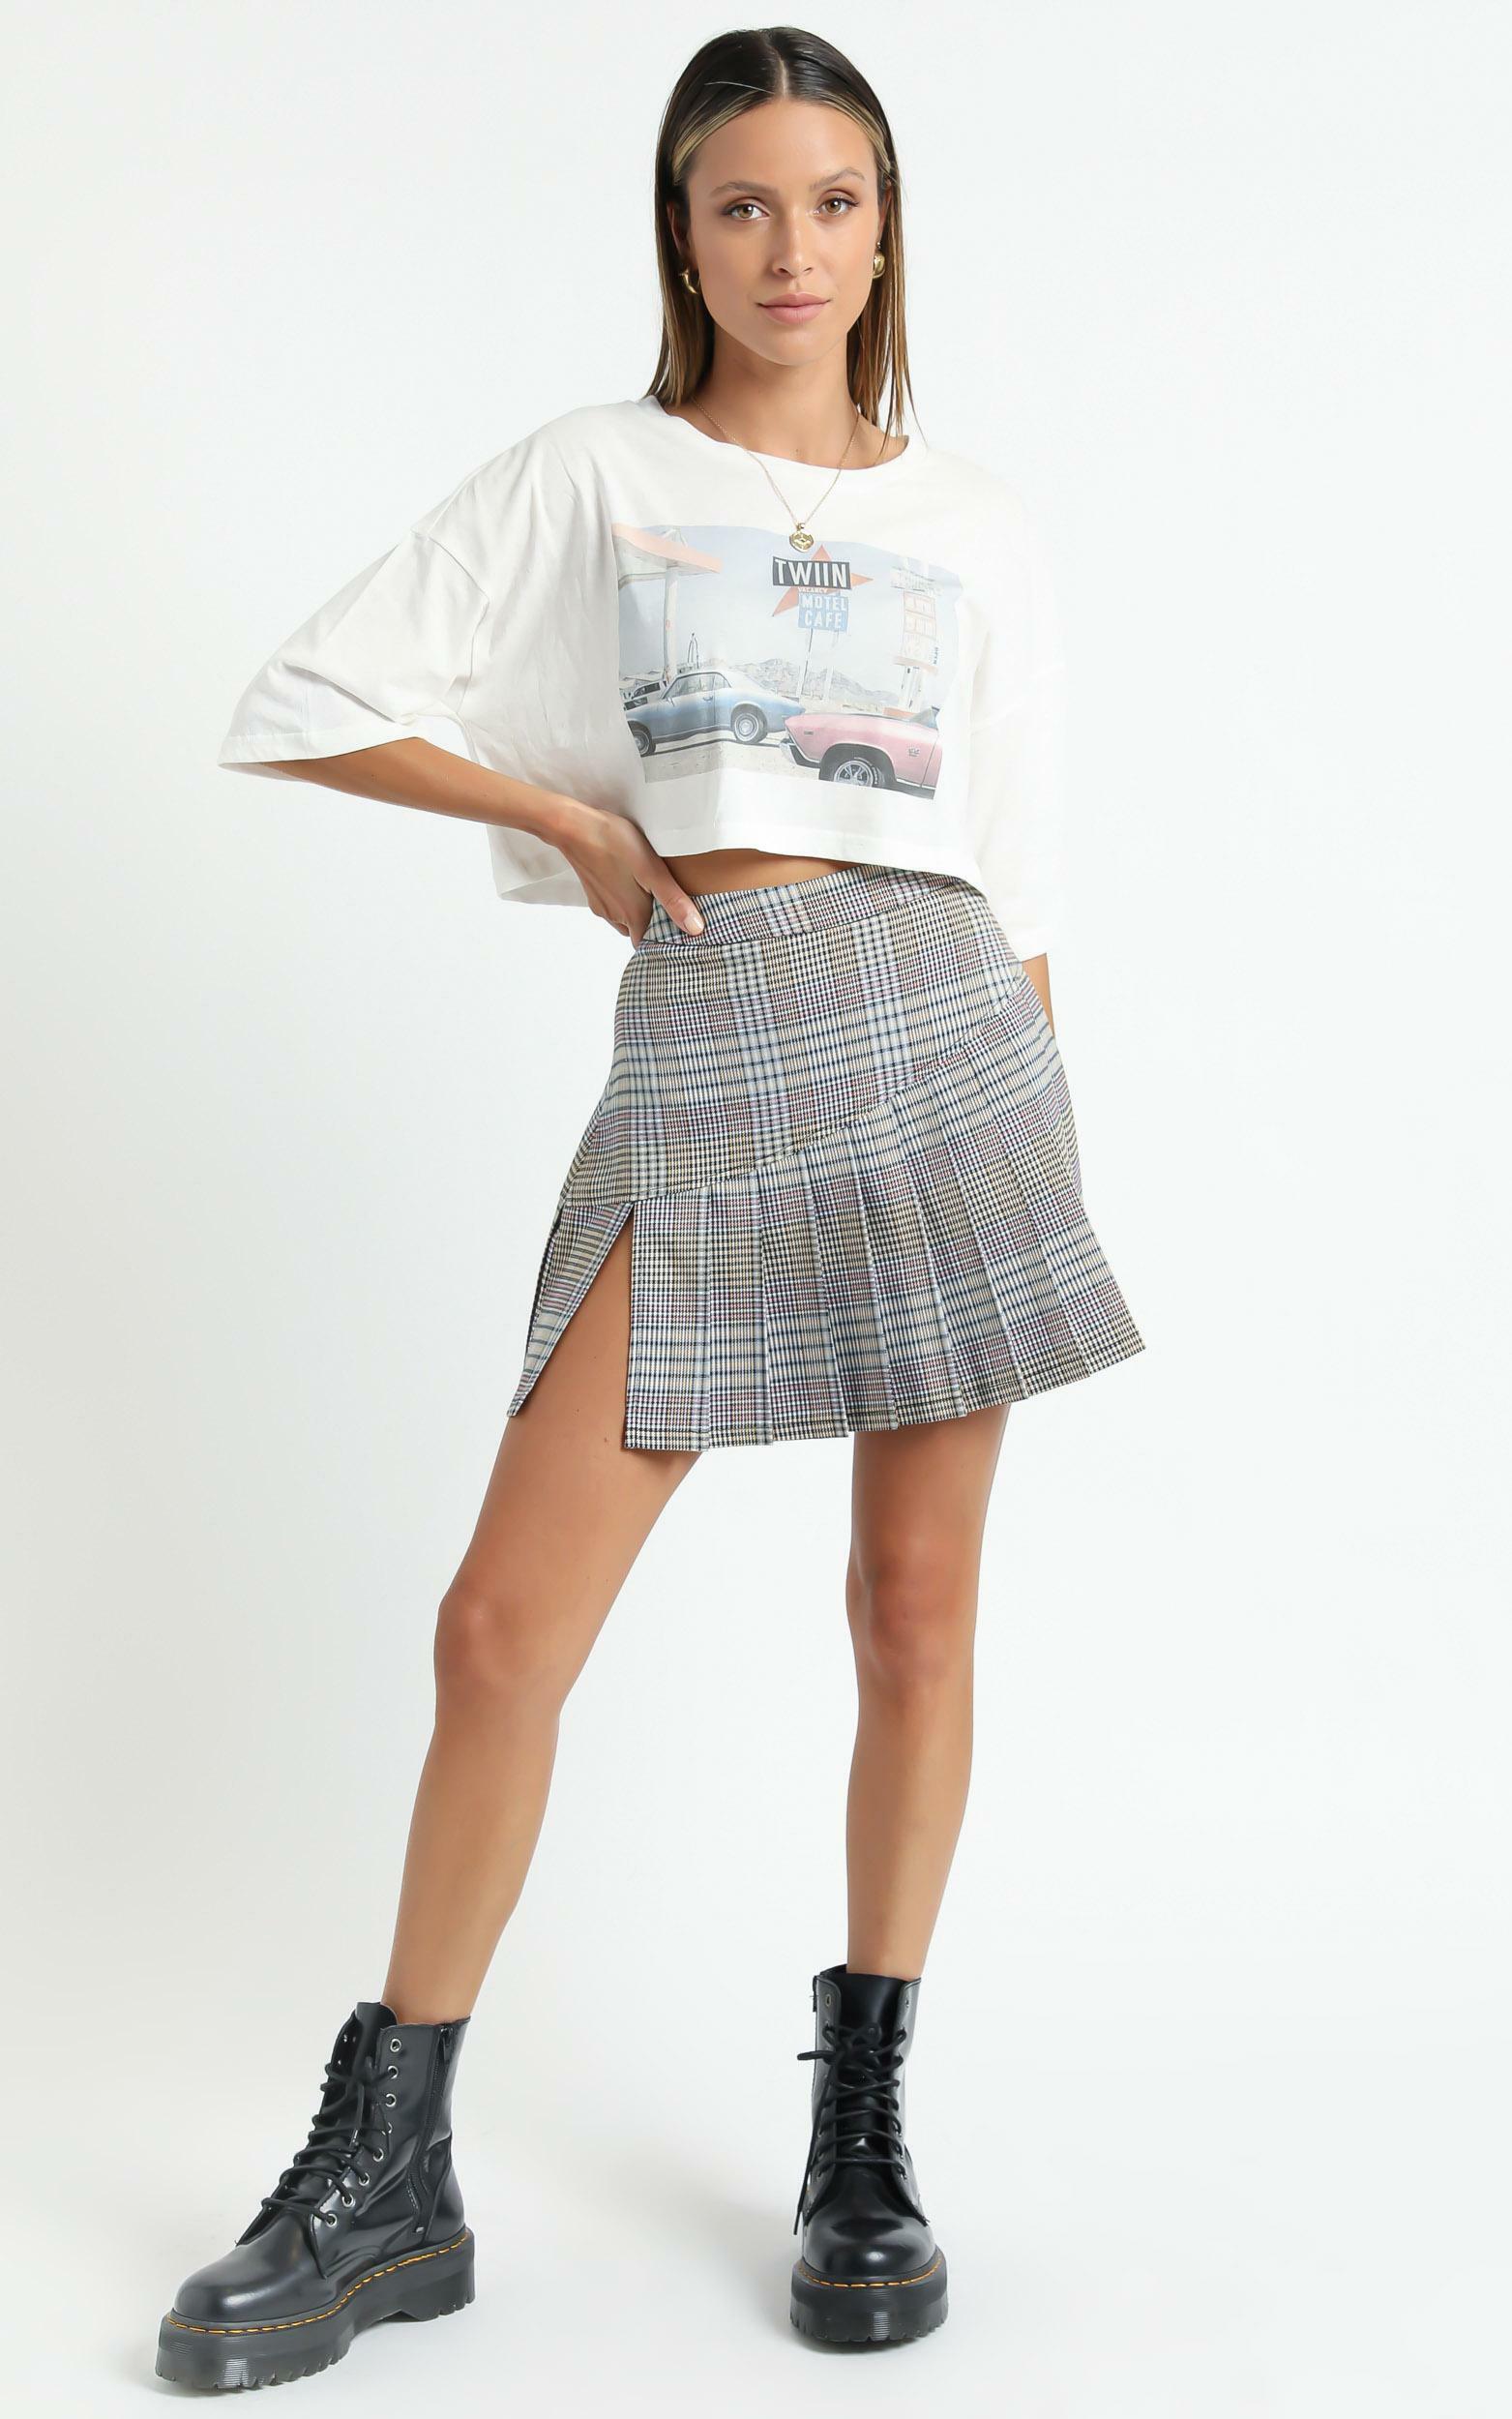 Twiin - Depict Mini Skirt in Multi - XS, Grey, hi-res image number null